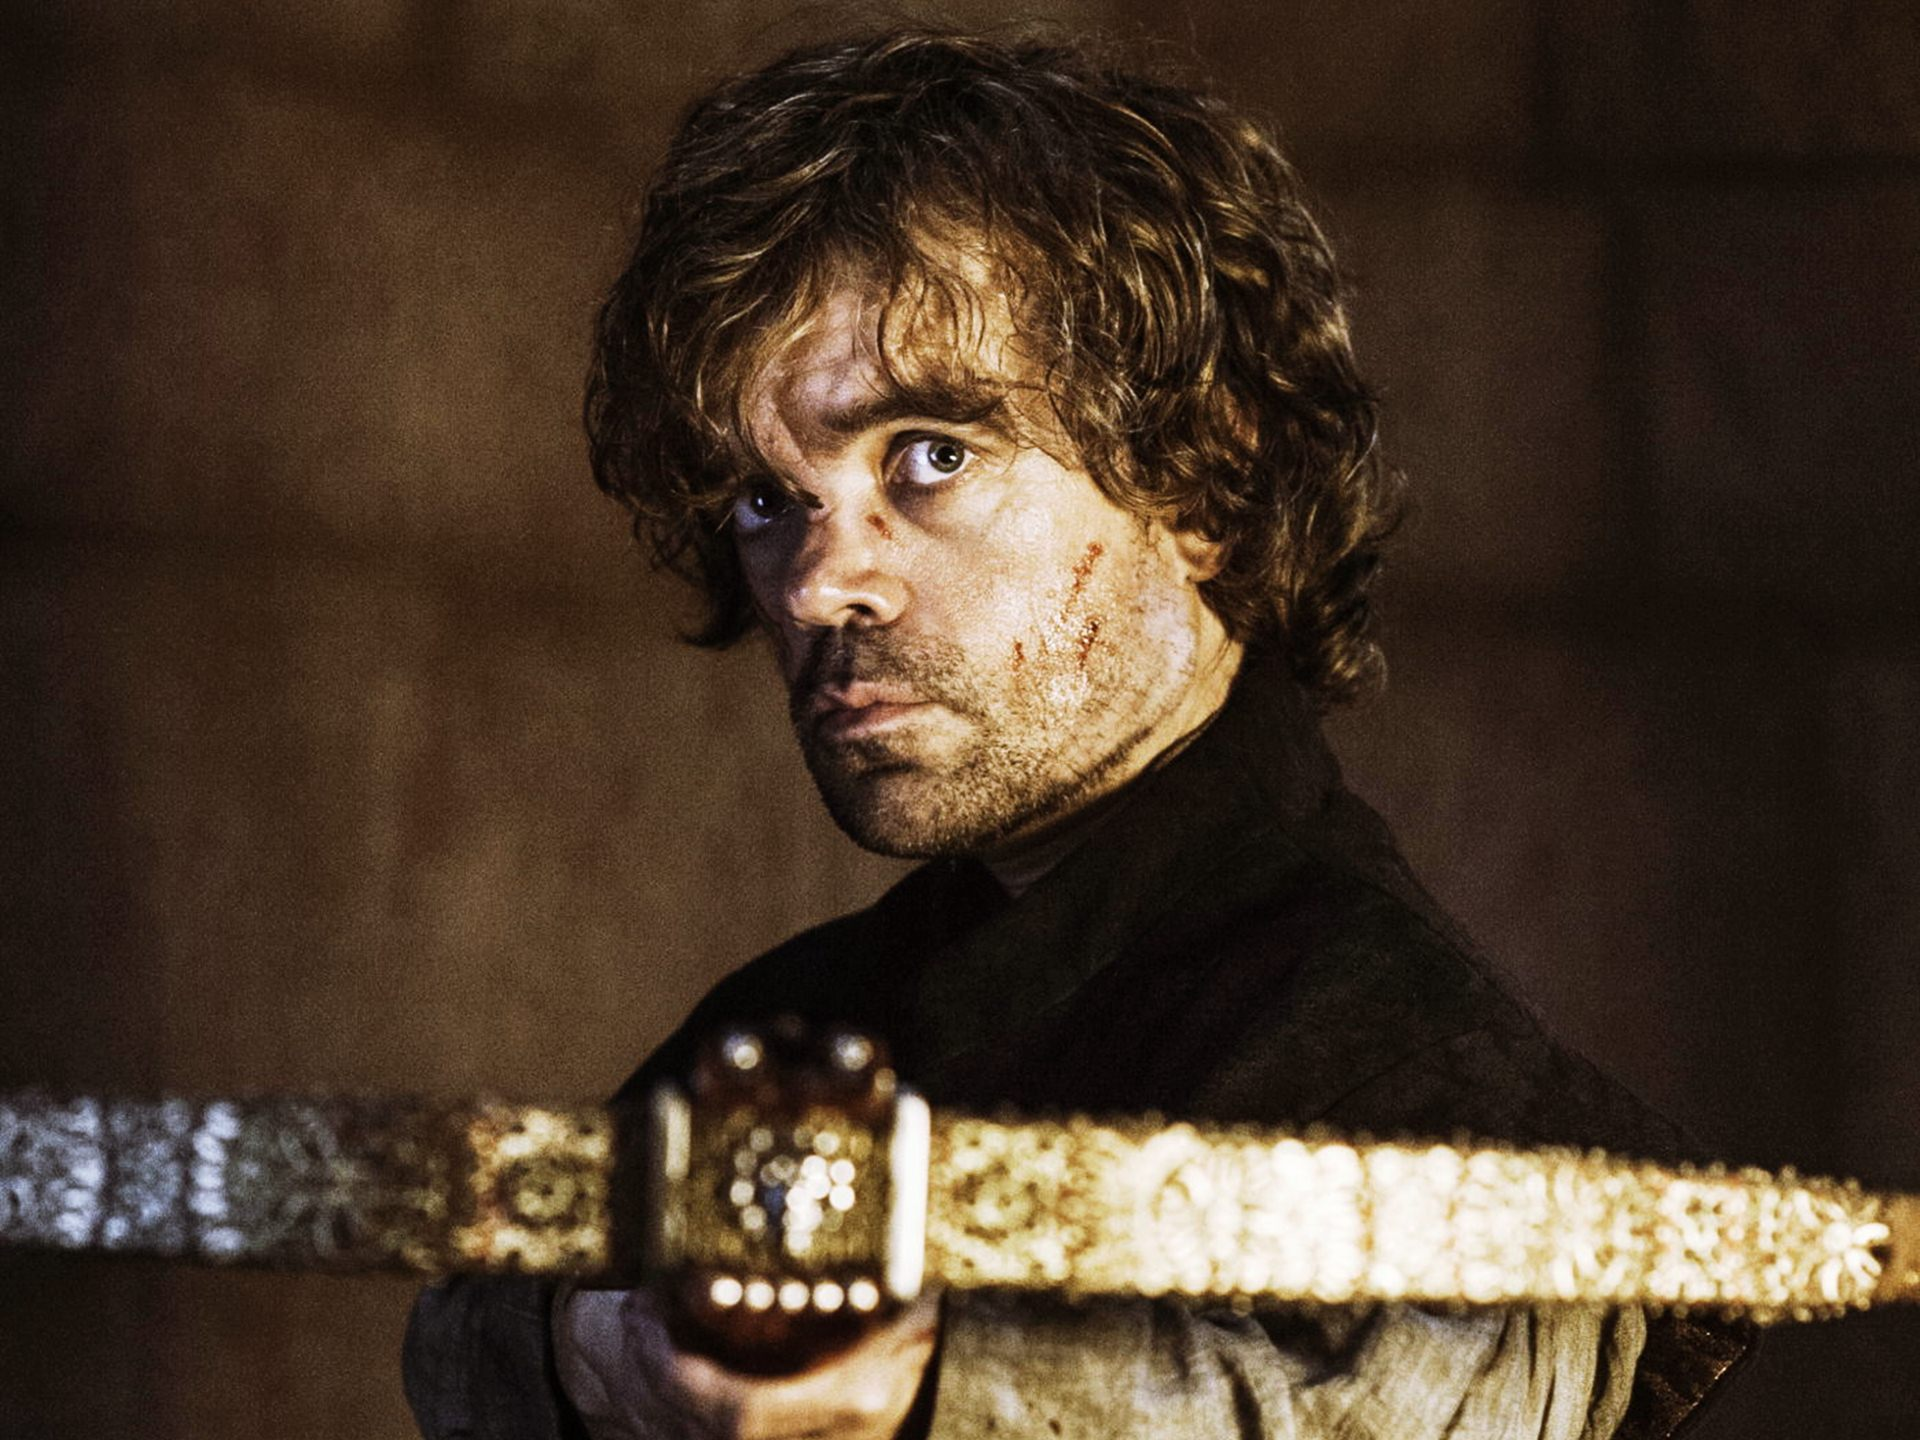 Game of Thrones season 4 Peter Dinklage hd wallpaper PoPoPicscom 1920x1440